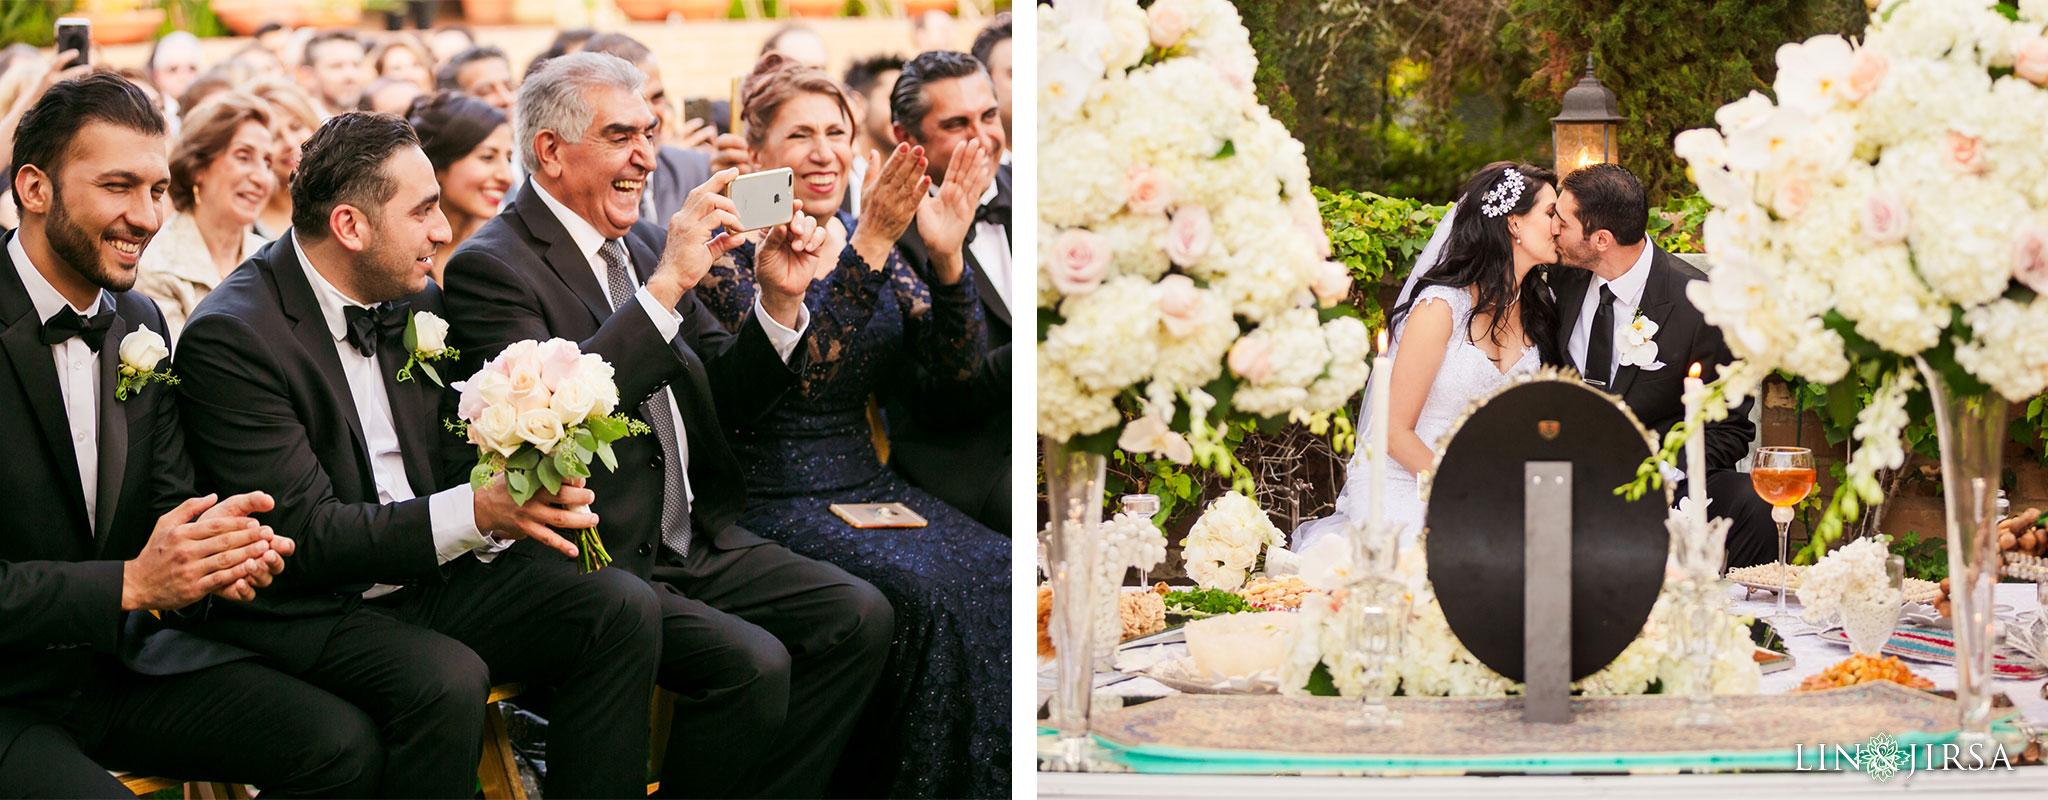 035 estancia la jolla hotel spa persian sofreh wedding ceremony photography